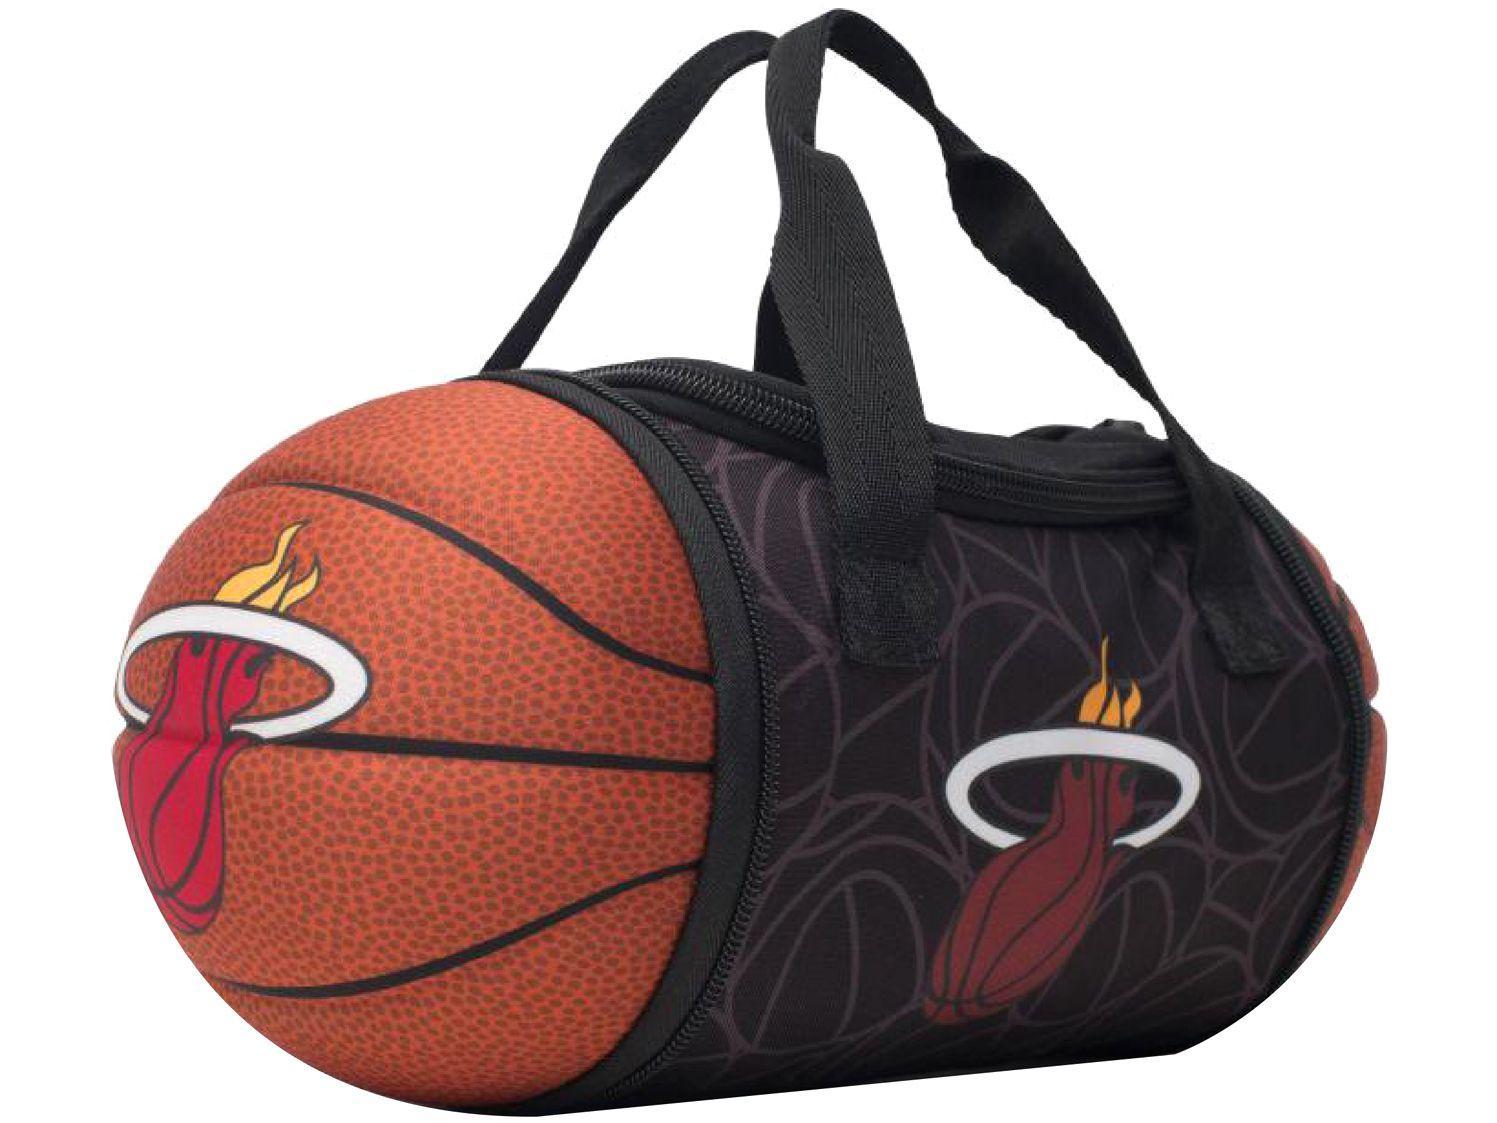 Bolsa Térmica Maccabi Art 4,7L Miami Heat - Preto e Laranja